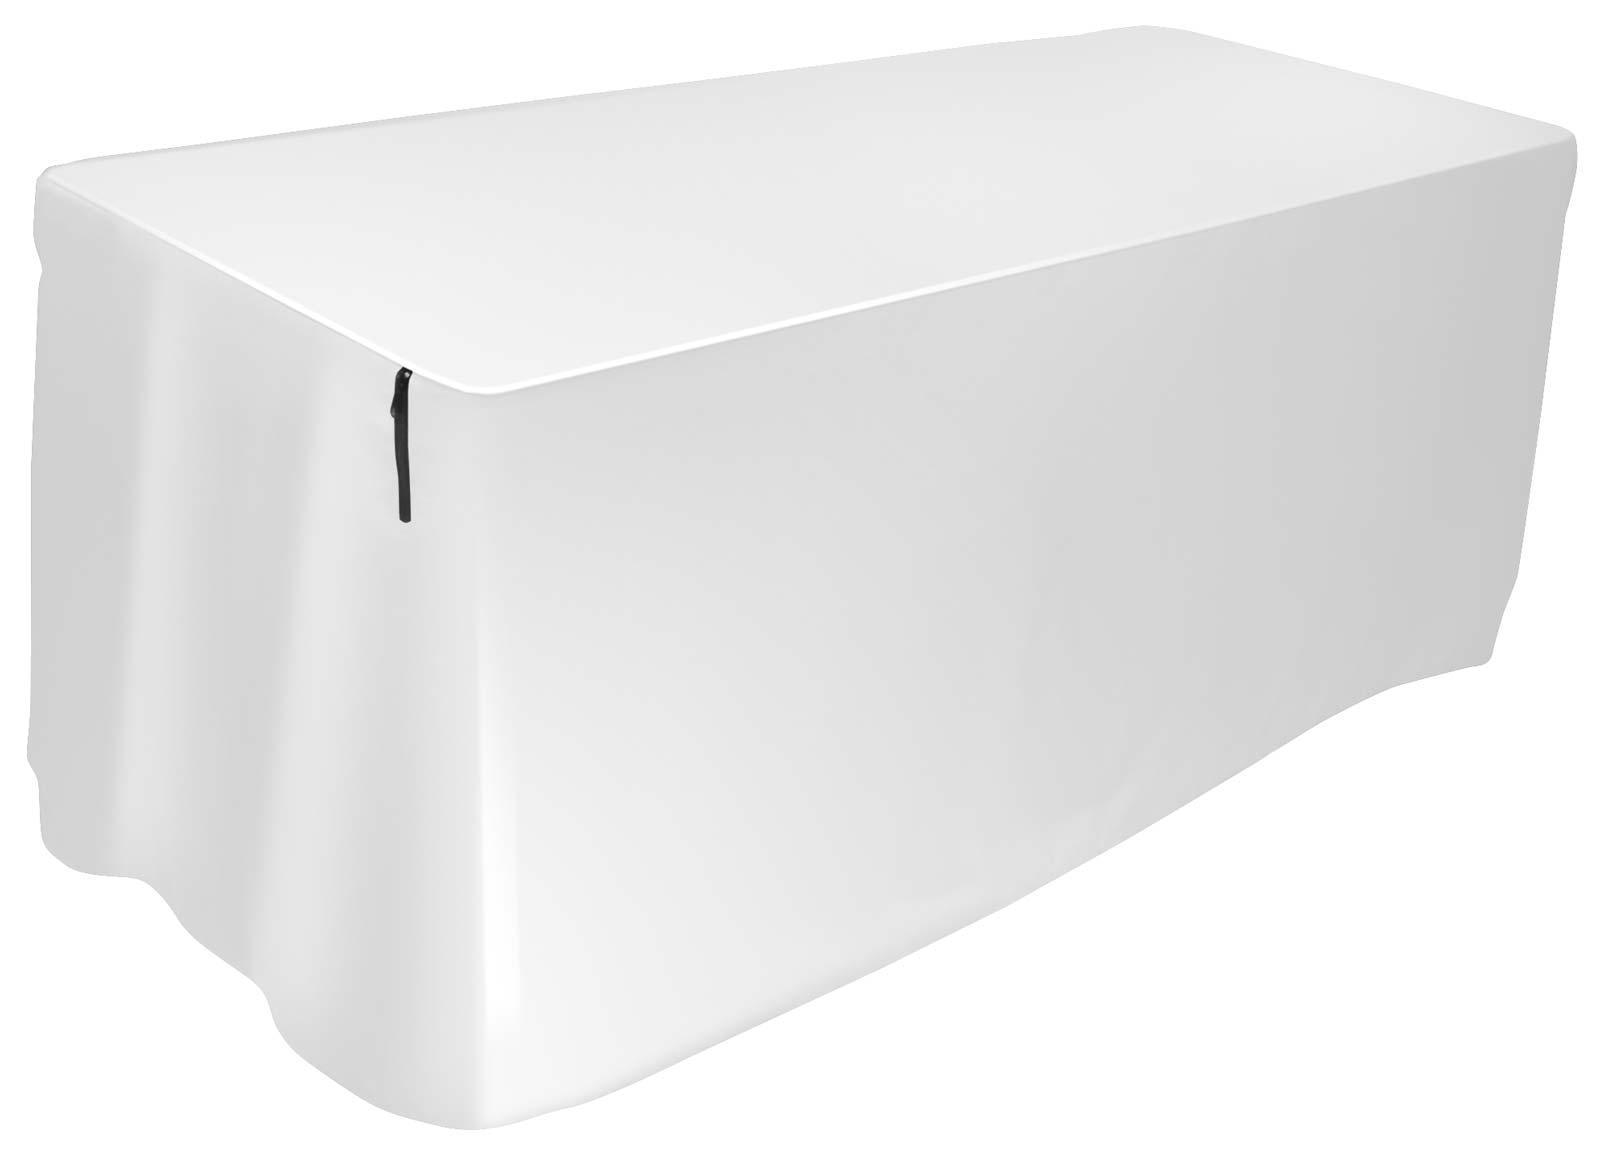 ULTIMATE SUPPORT USDJ-6TCW  sc 1 st  Agiprodj & ULTIMATE SUPPORT USDJ-6TCW | 6ft Table Cover White | agiprodj